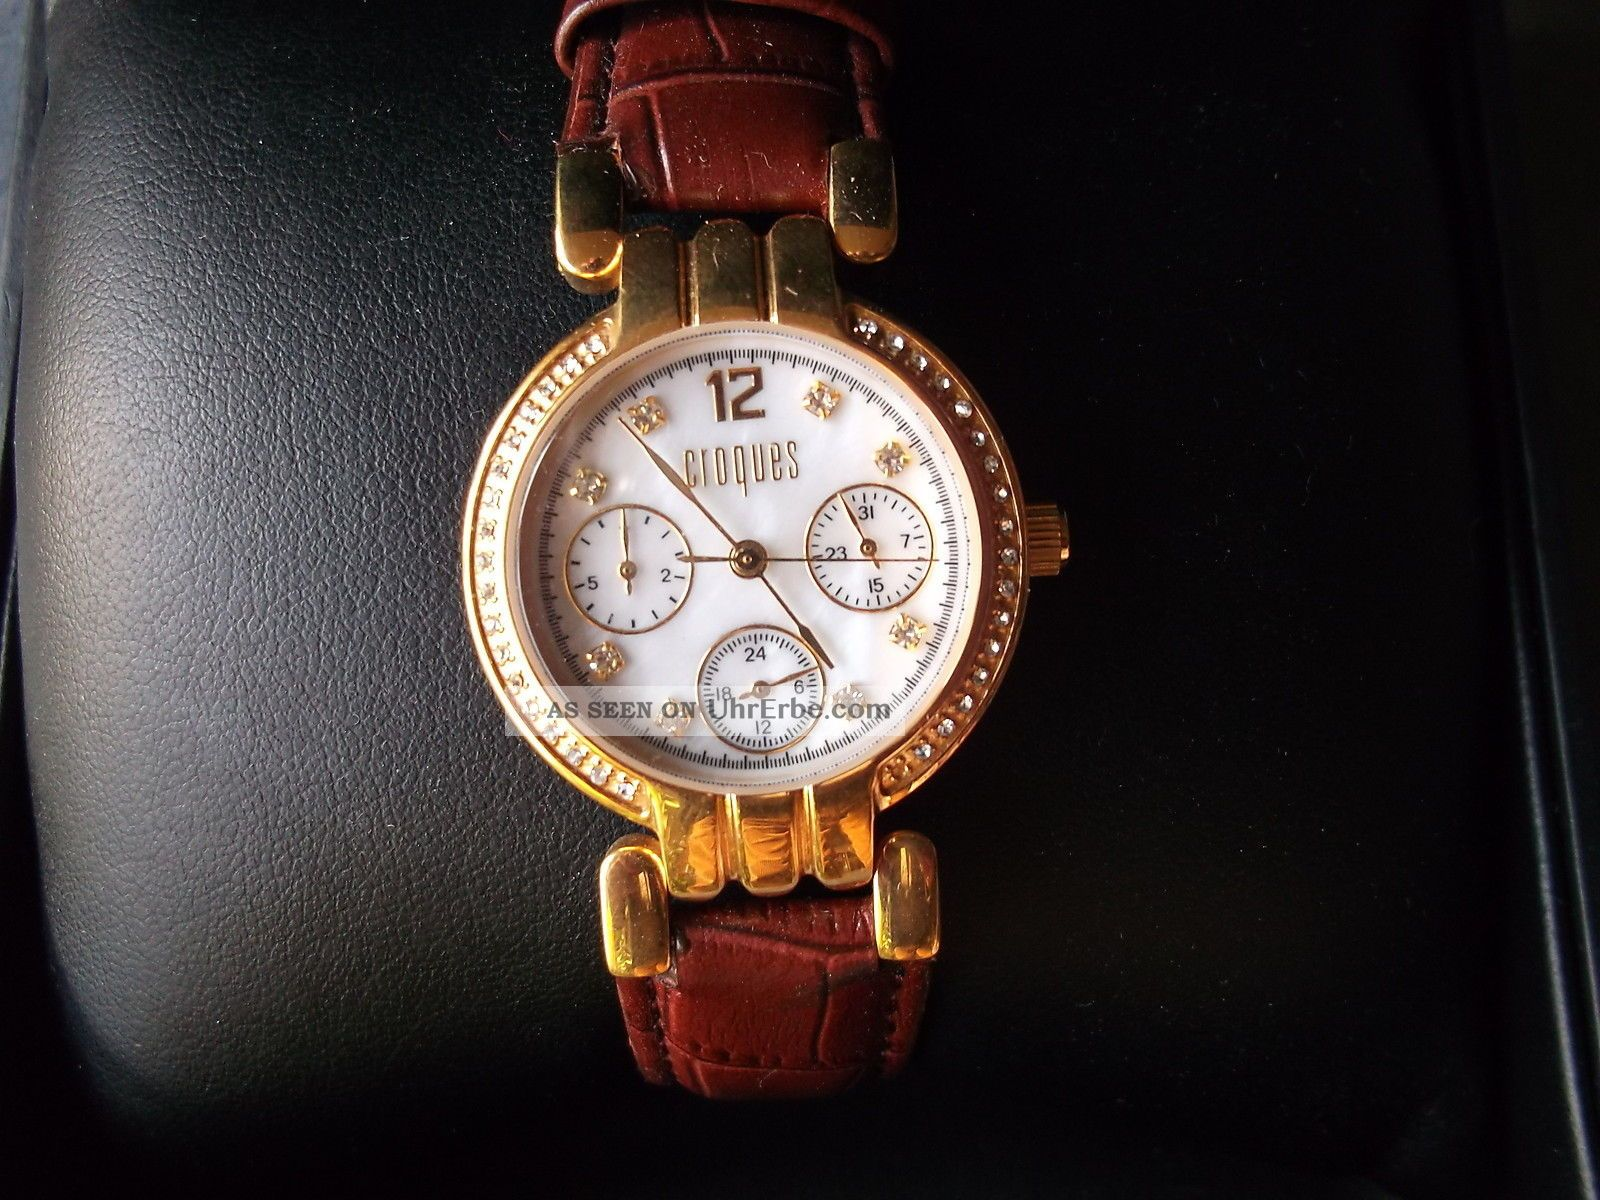 Damenuhr Armbanduhr Vergoldet Und Mit Datum Manufaktur Croques 7938 Armbanduhren Bild